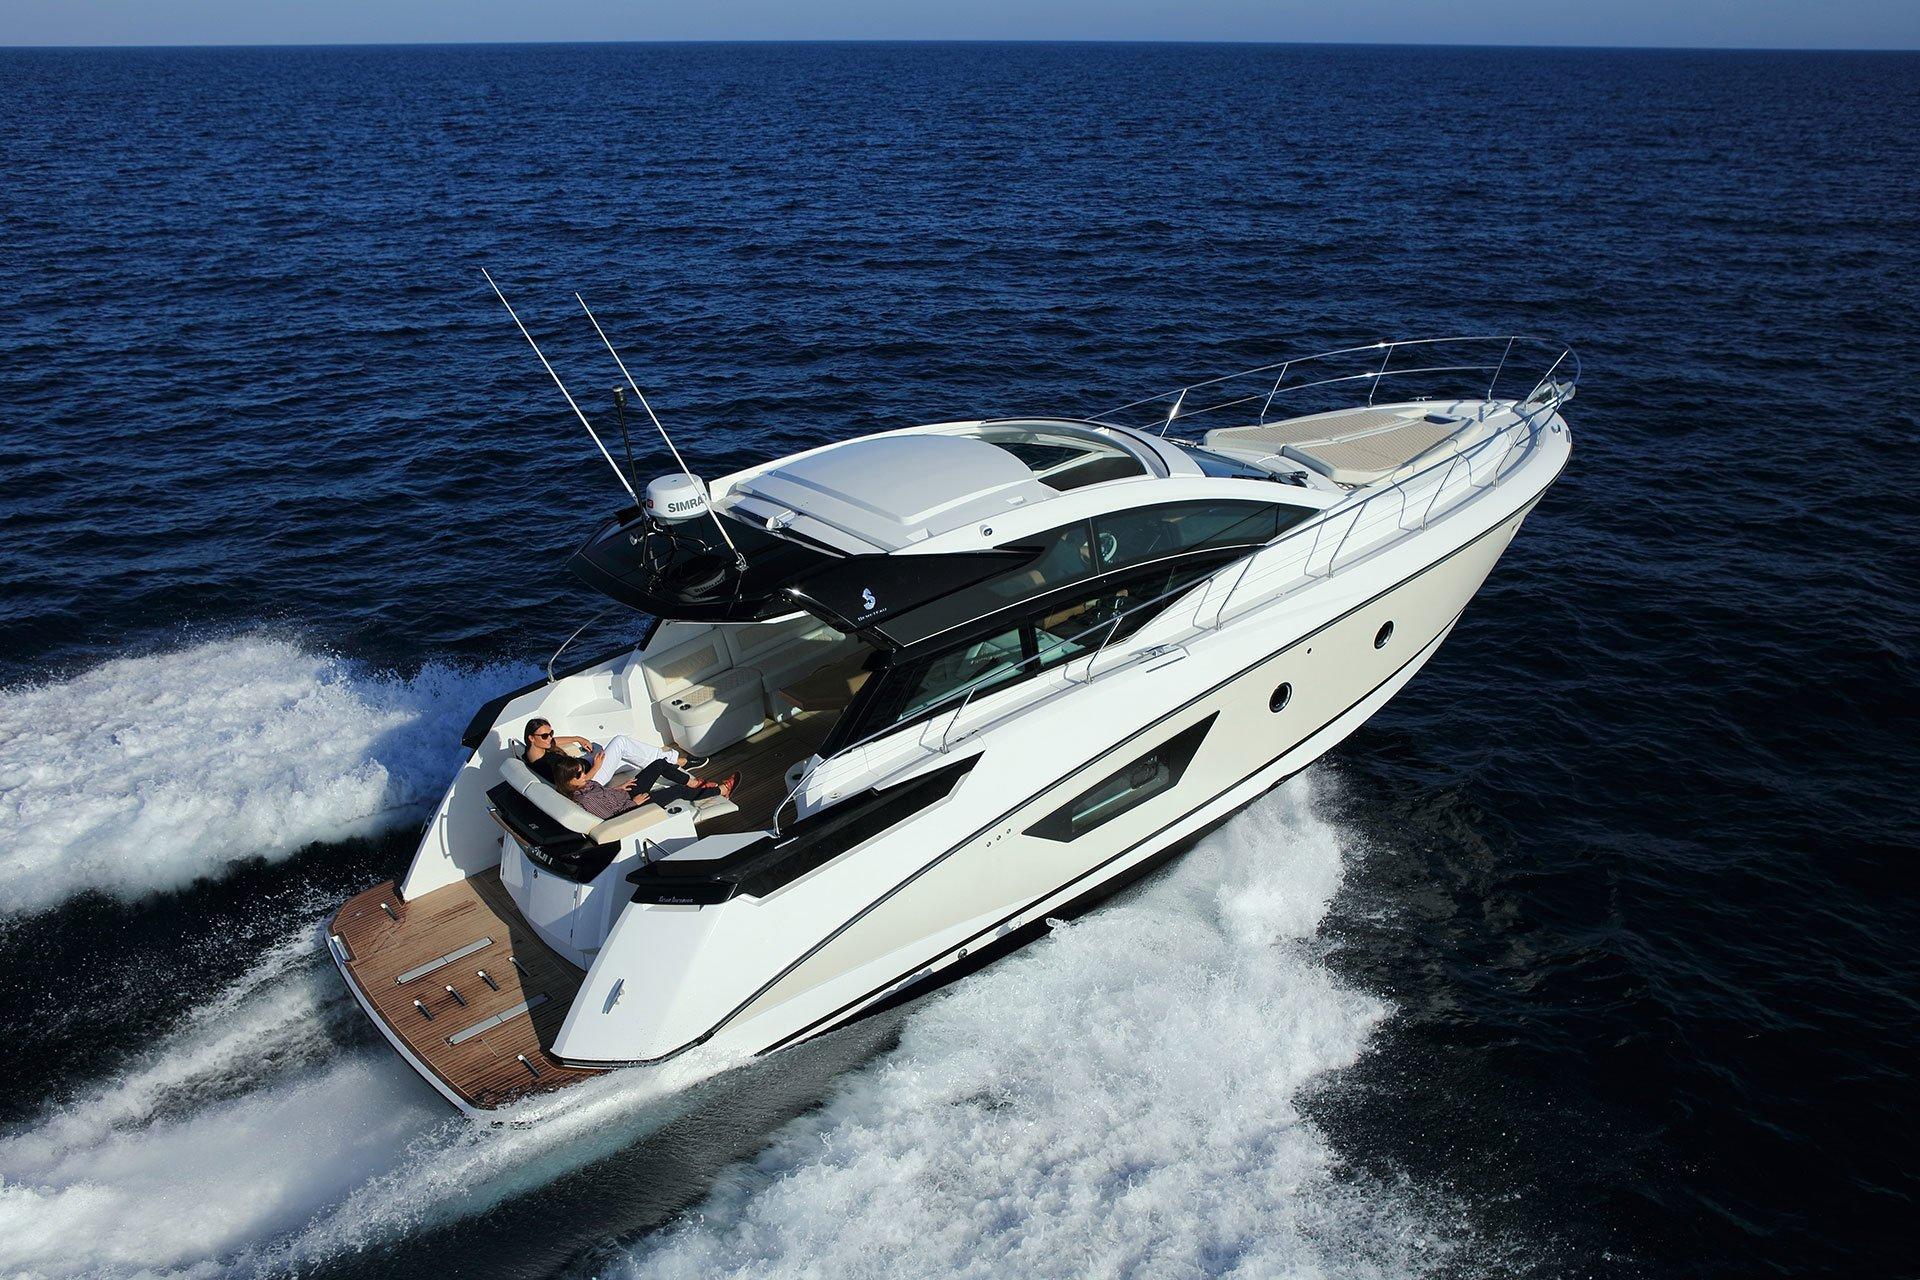 Beneteau gran turismo 46 luxury motor yachts for sale for Large motor yachts for sale